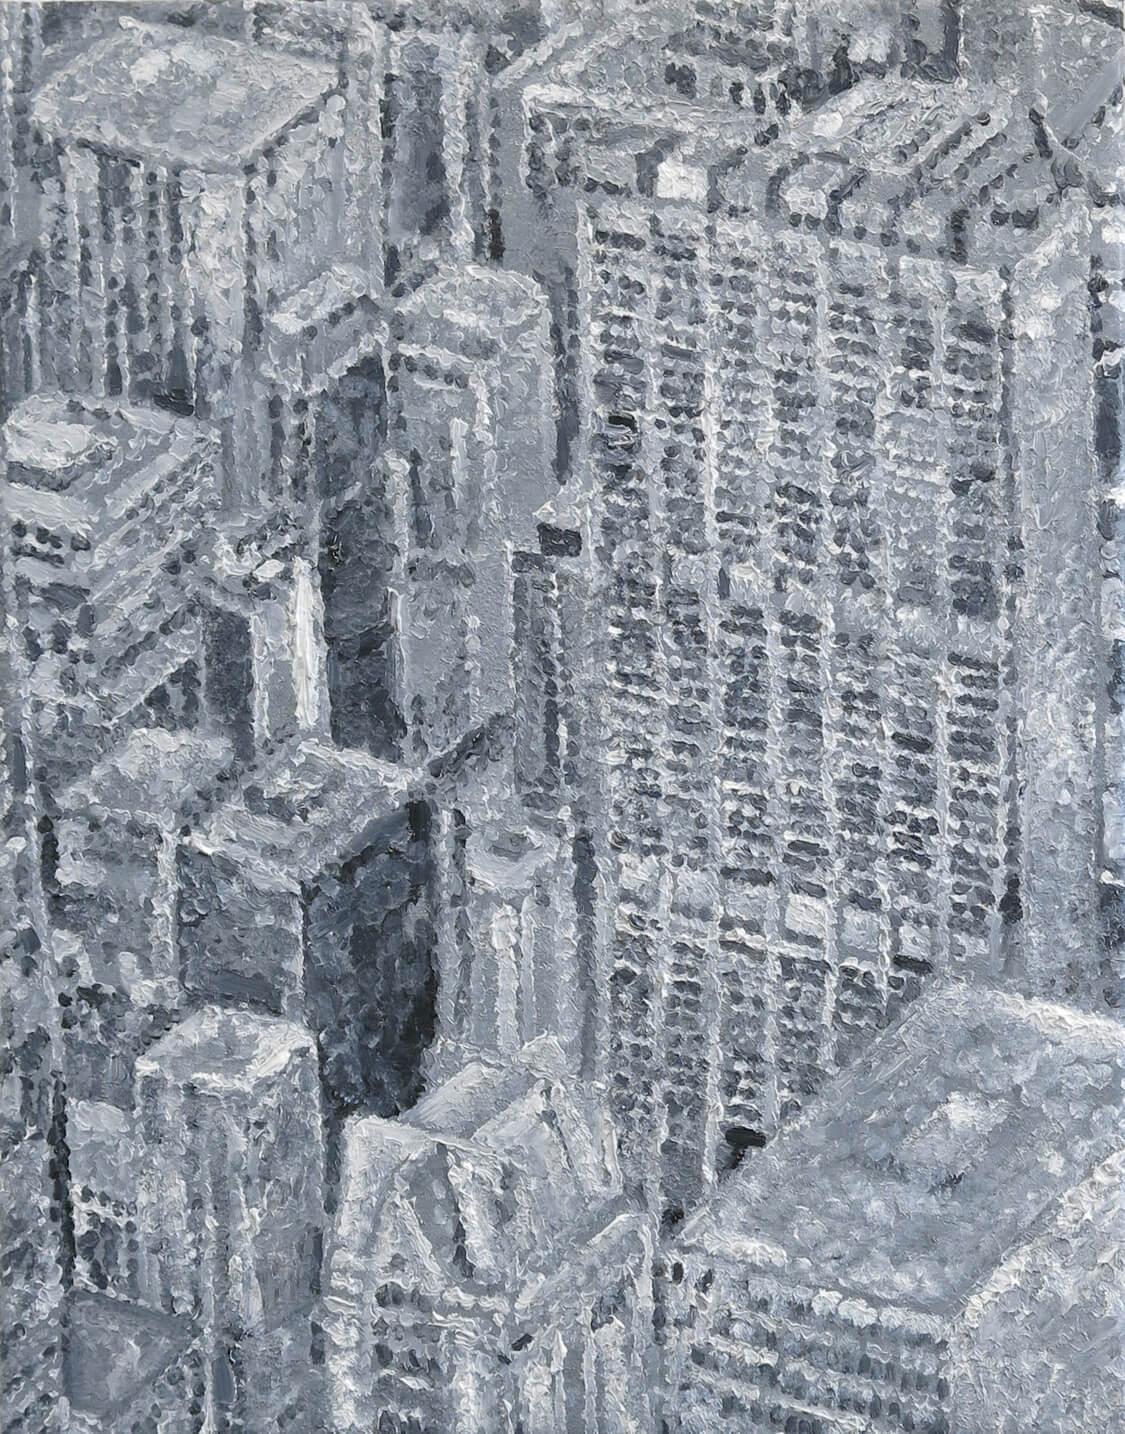 Urban View - Oil on Canvas, 70 x 55 cm, 2014